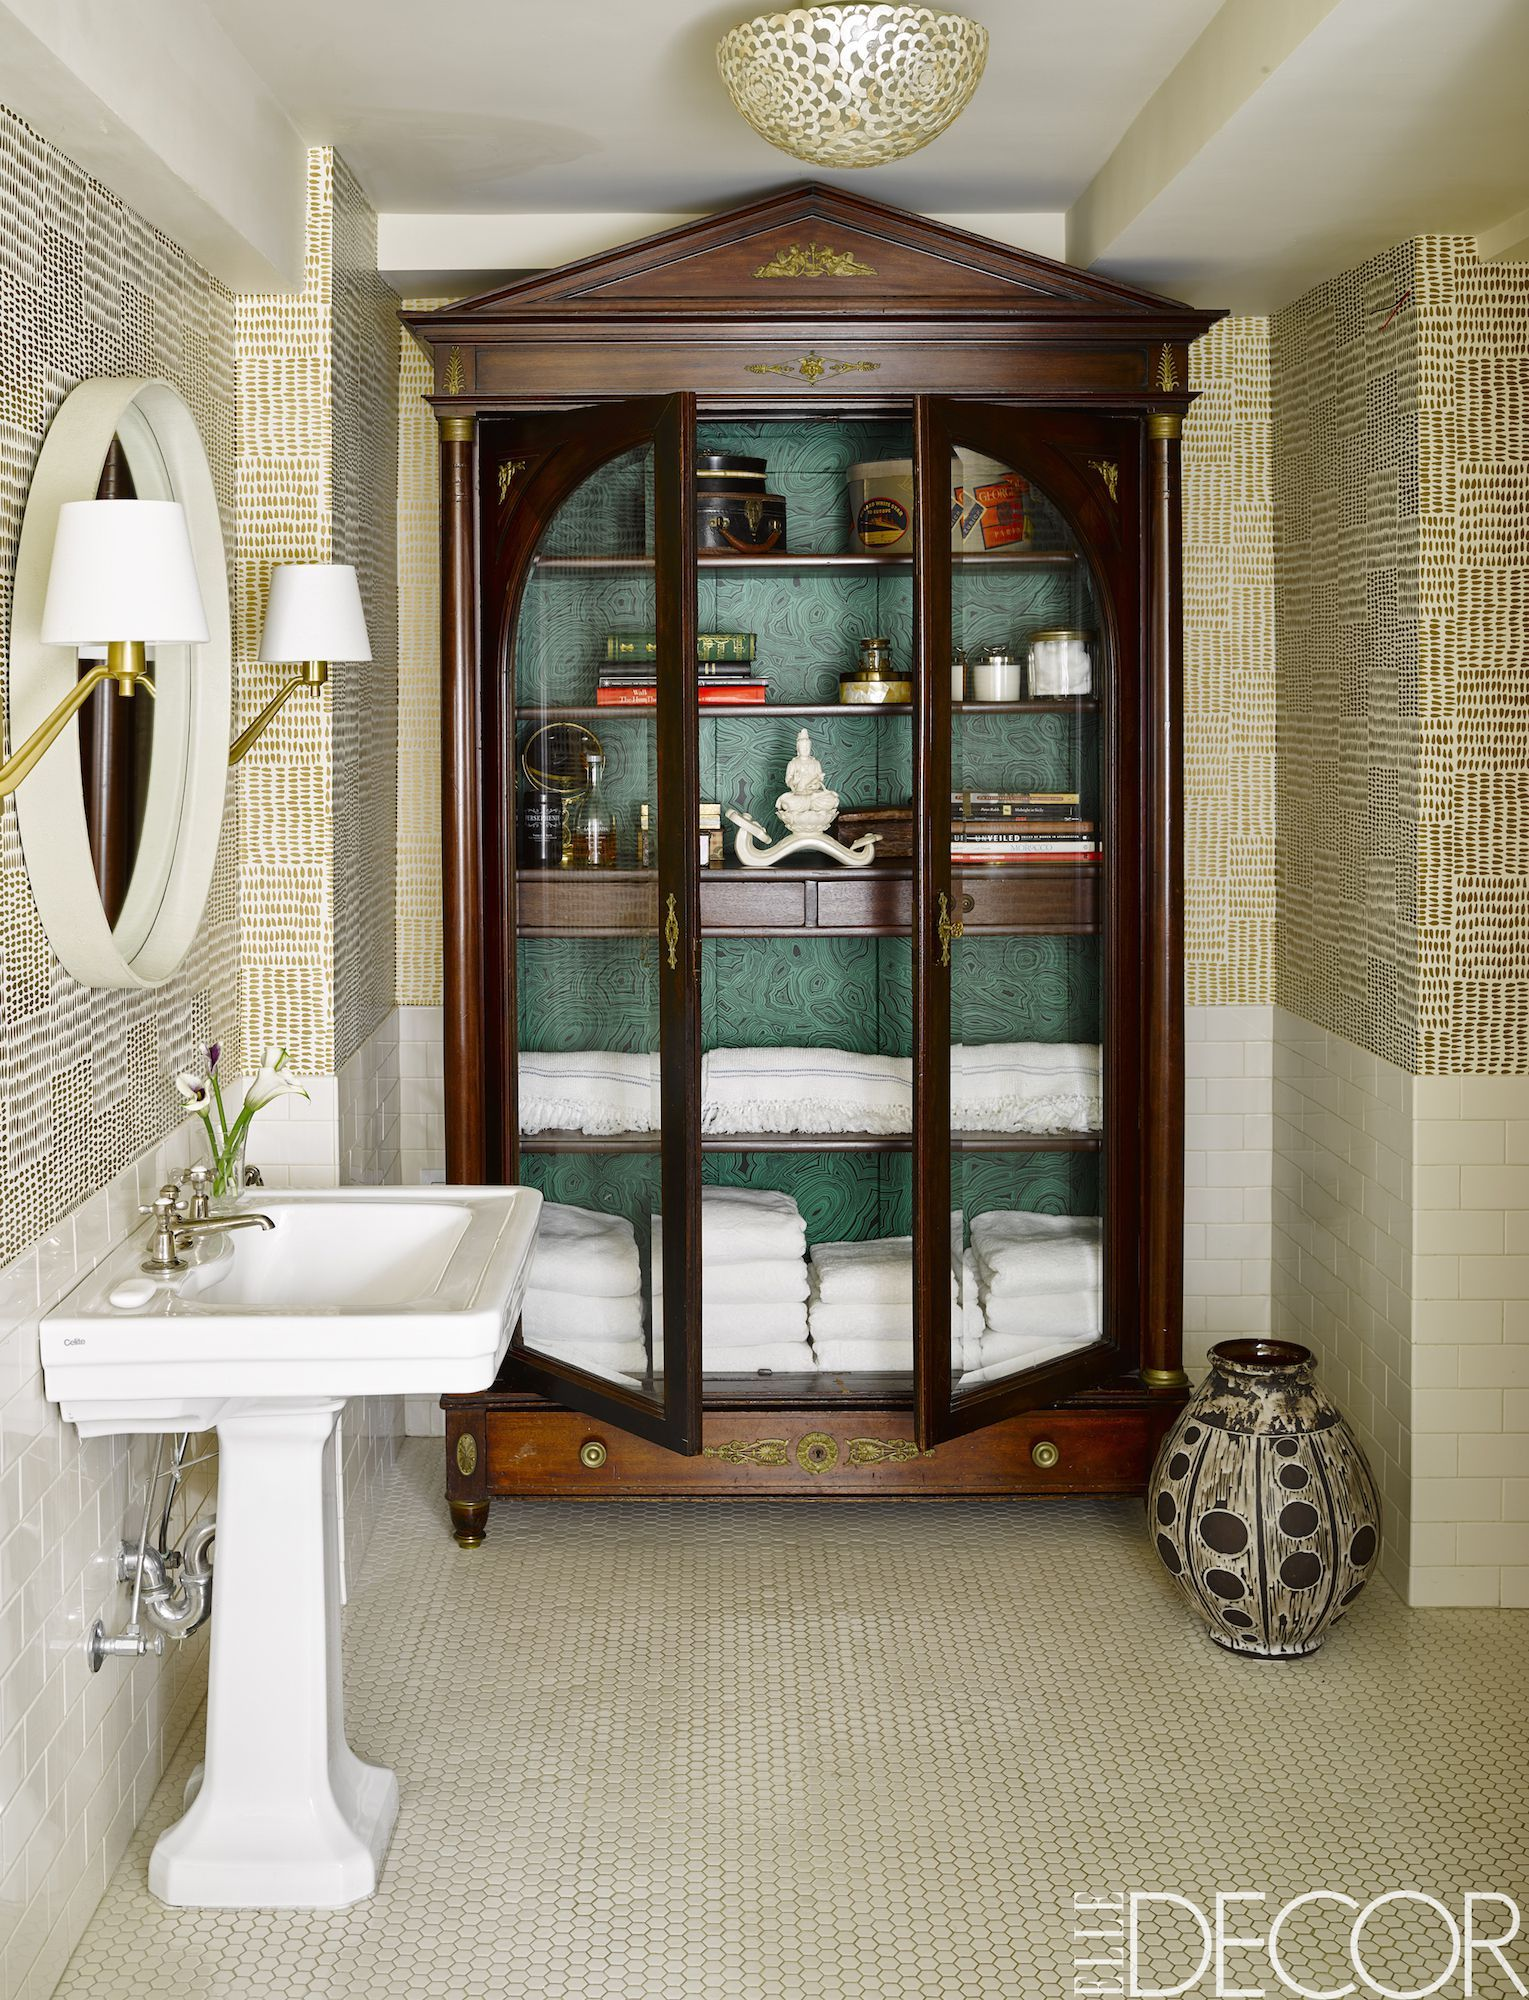 100 Beautiful Bathrooms Ideas & Bathroom Design Gallery